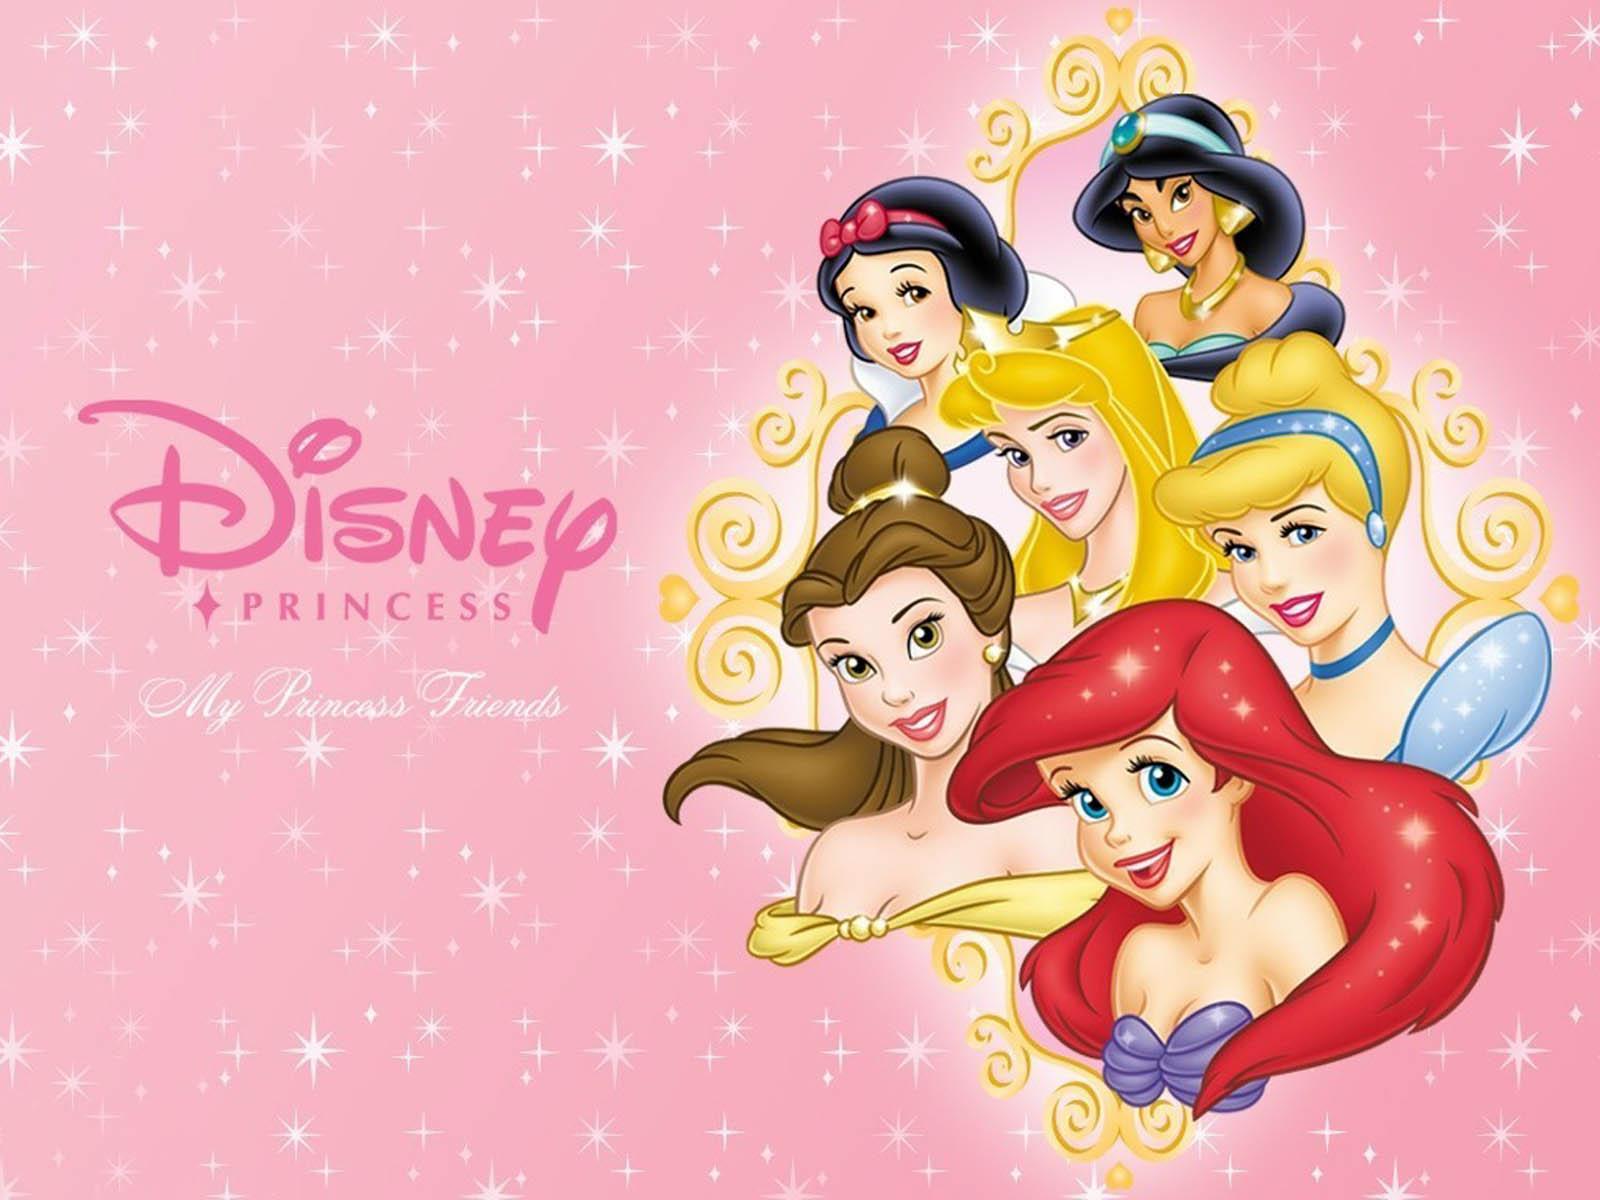 disney princess desktop wallpapers - photo #19